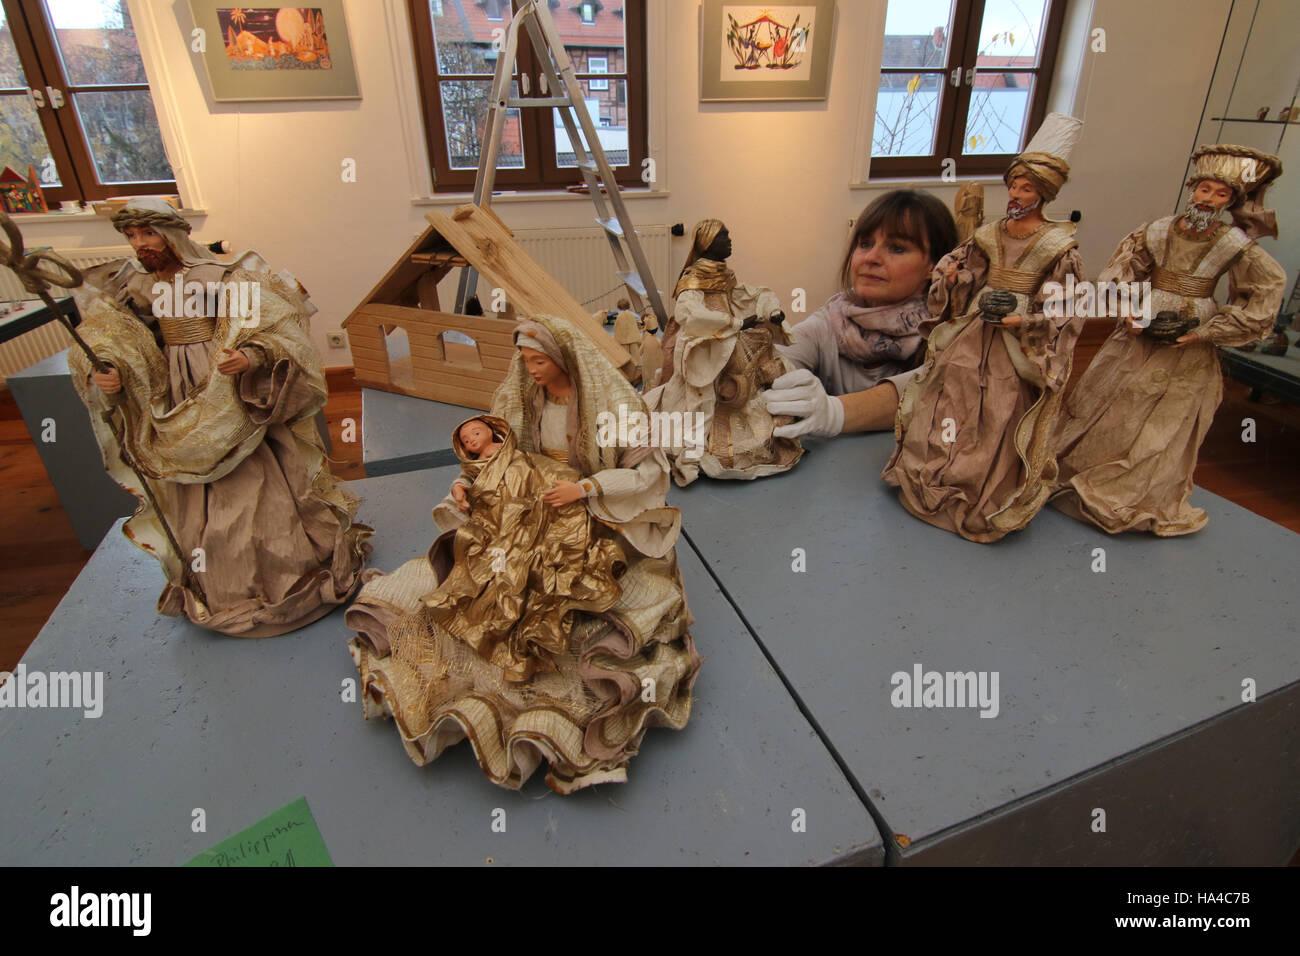 Nativity Scenes Stock Photos & Nativity Scenes Stock Images - Alamy